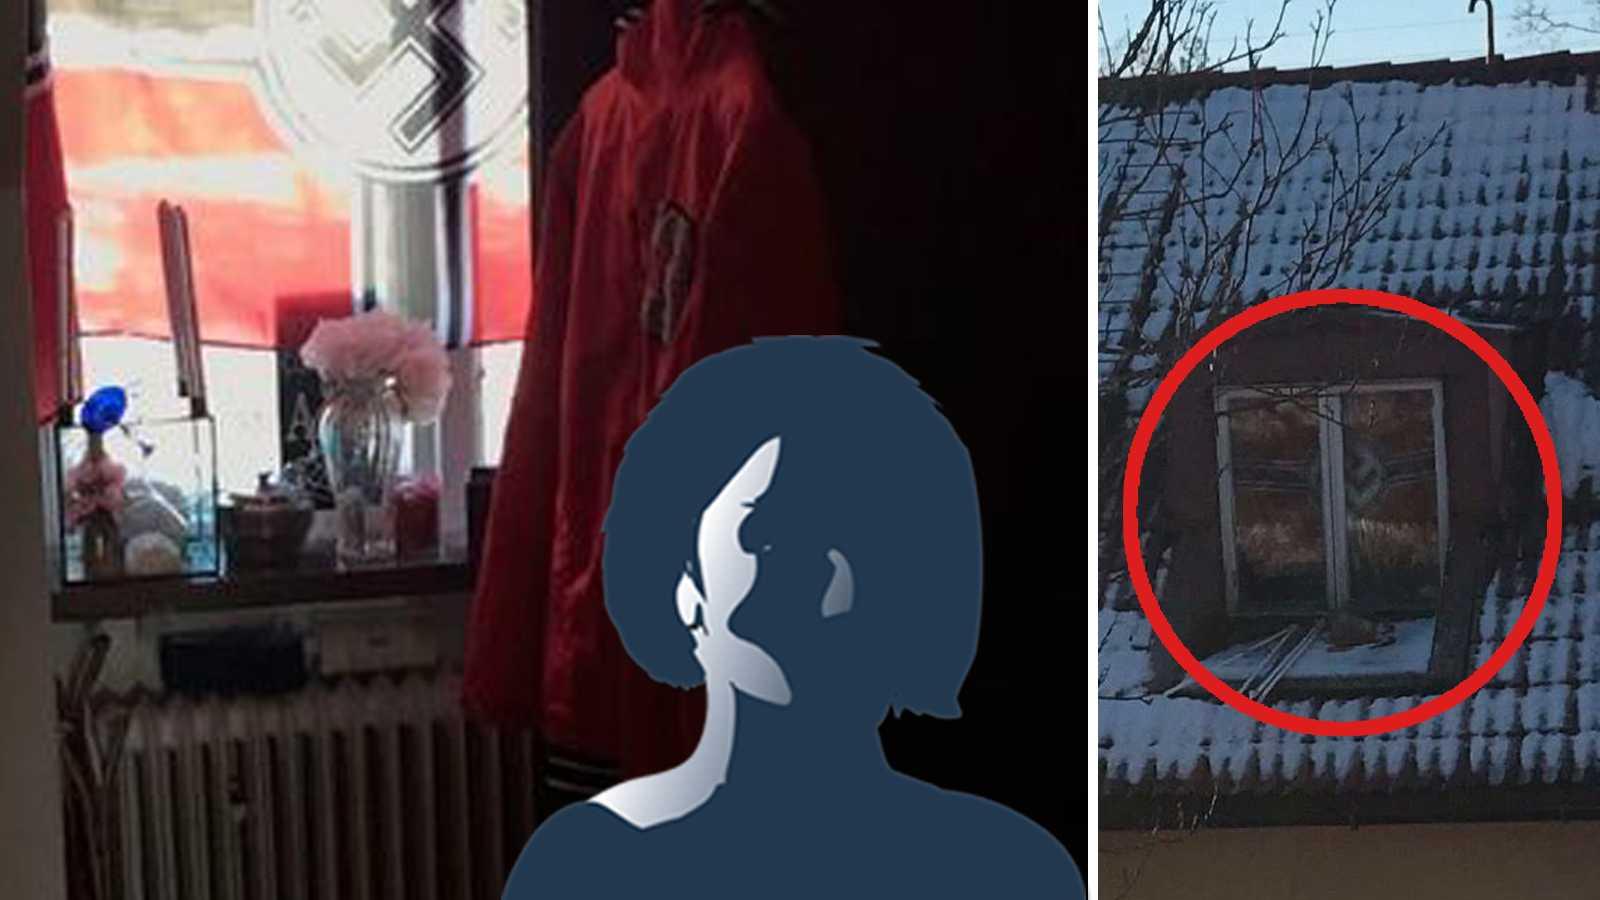 26 Arig Kvinna Hade Flagga Med Hakkors I Fonstret Aftonbladet